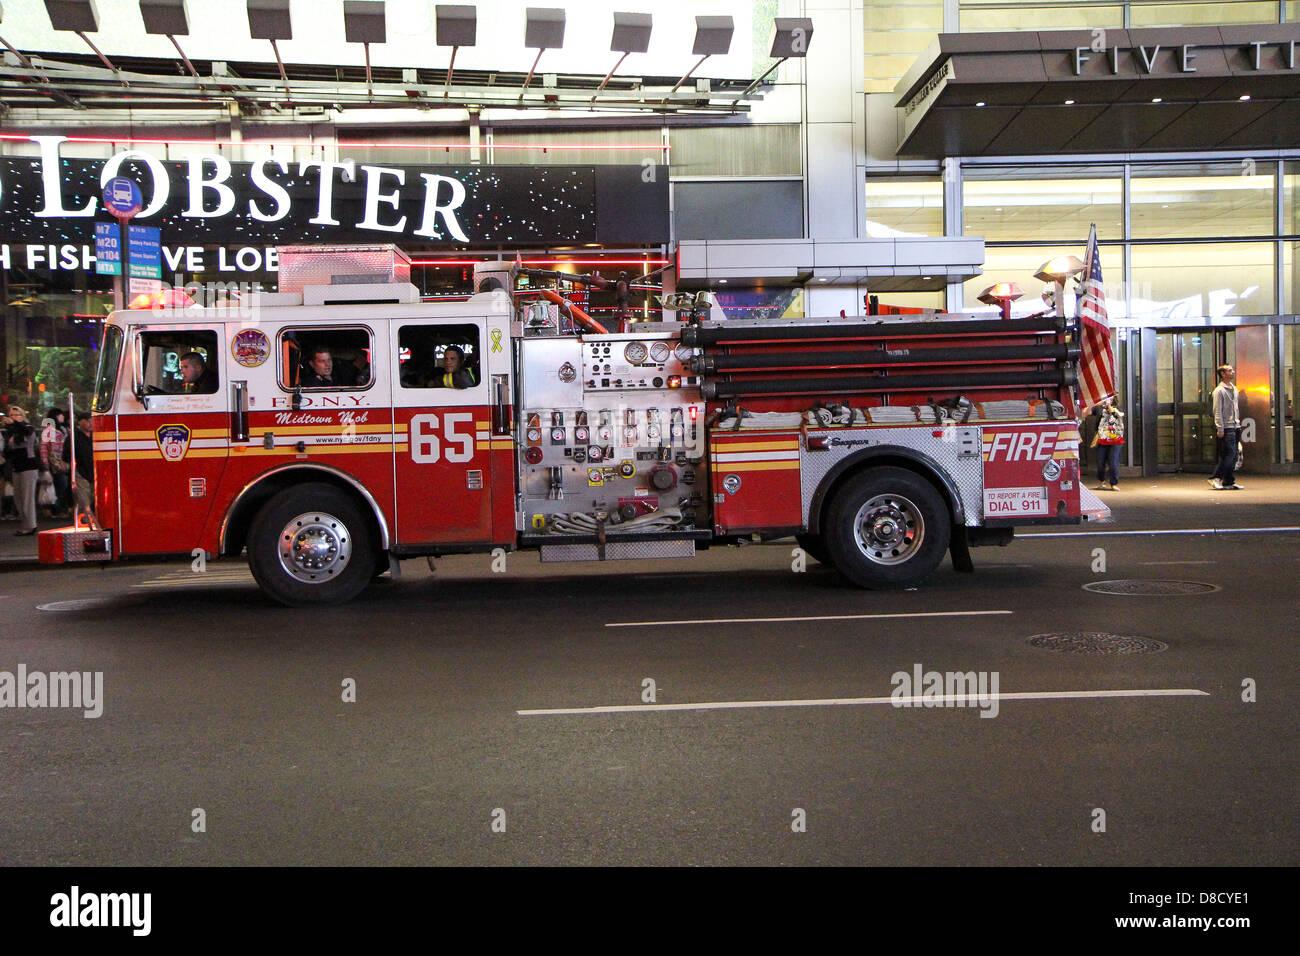 American Fire Engine Station outside Lobster restaurant ...